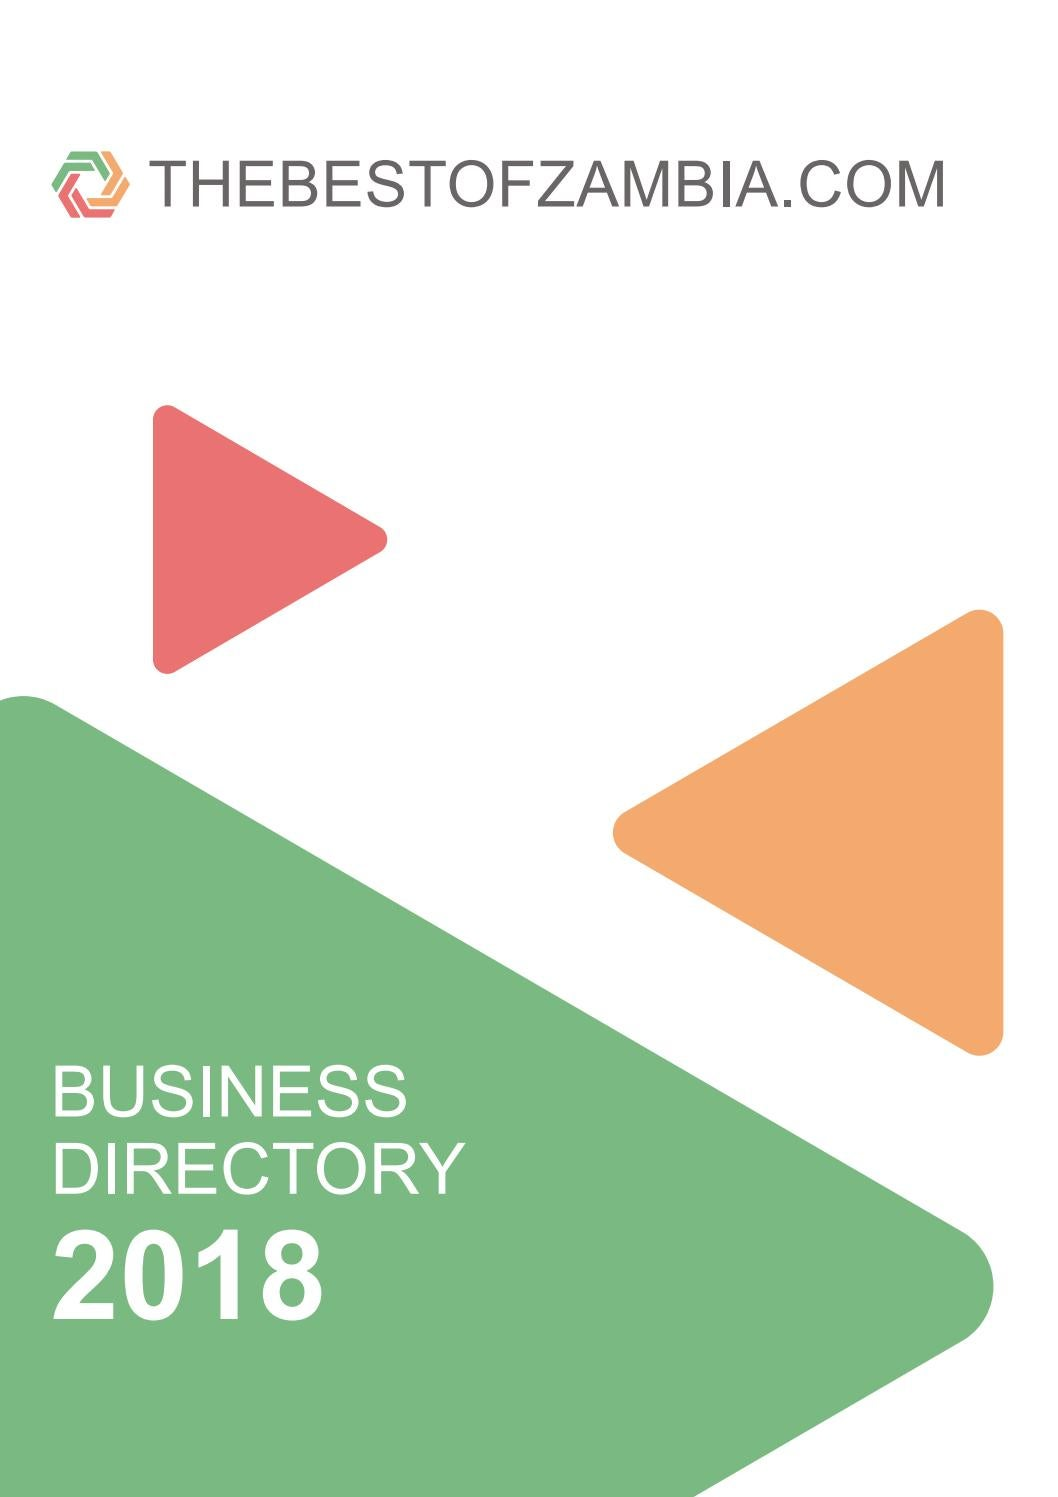 thebestofzambia.com business directory 2018 by Infobwana - issuu